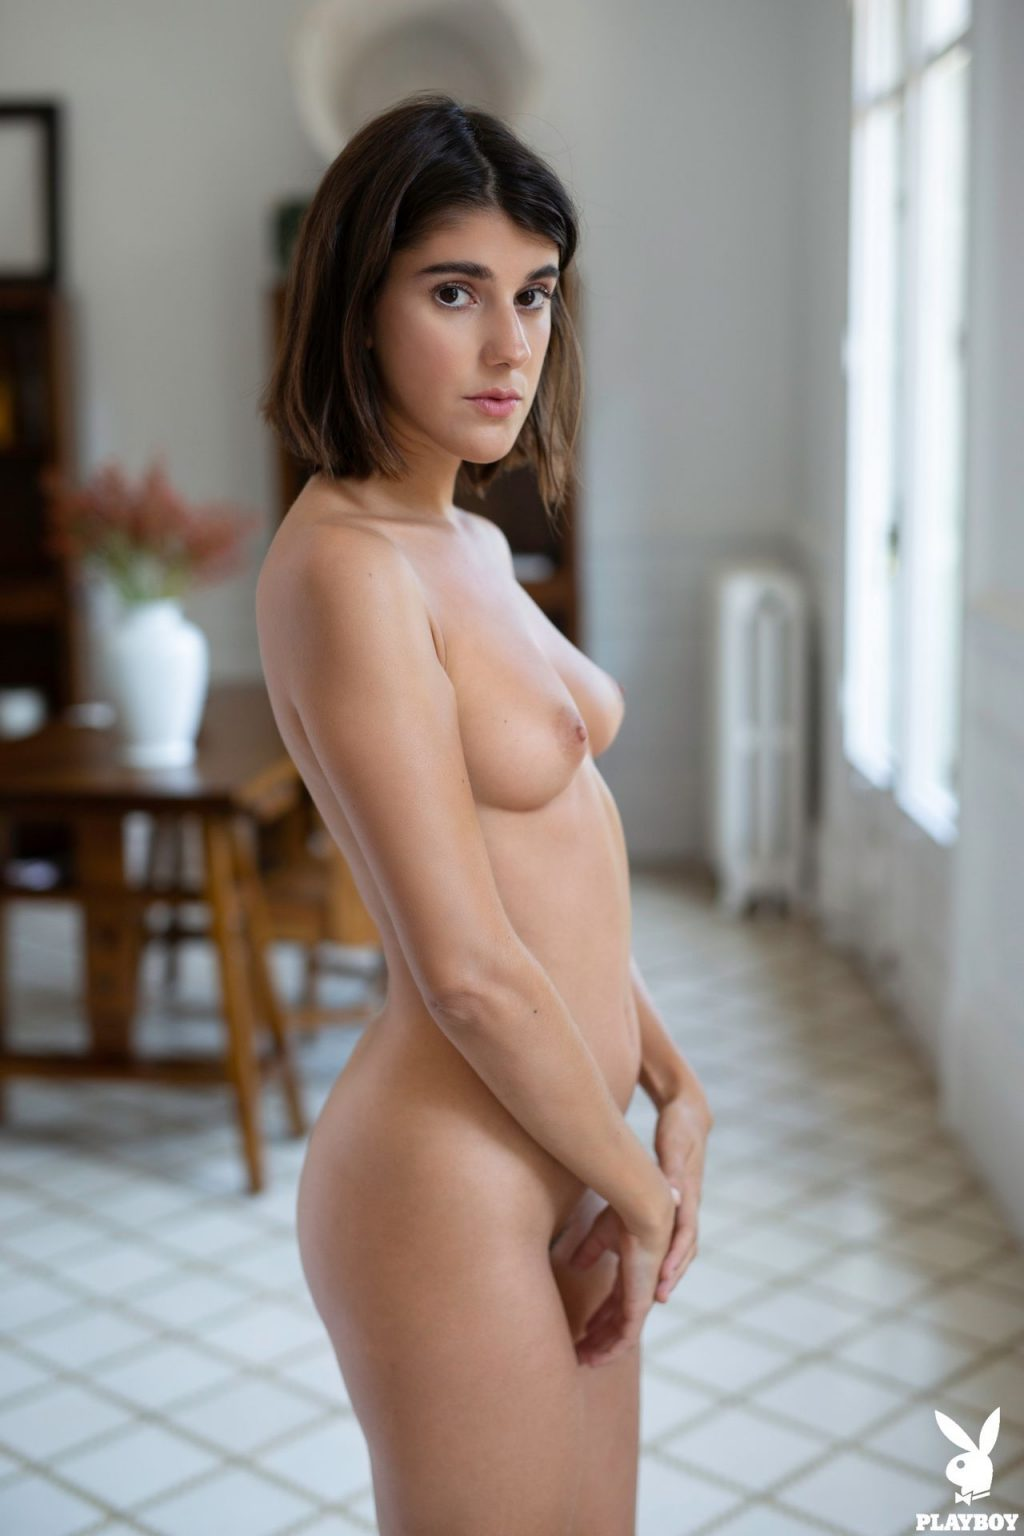 Ana Carolina Playboy ana maria naked (5 photos) – ( ͡° ͜ʖ ͡°) |the fappening